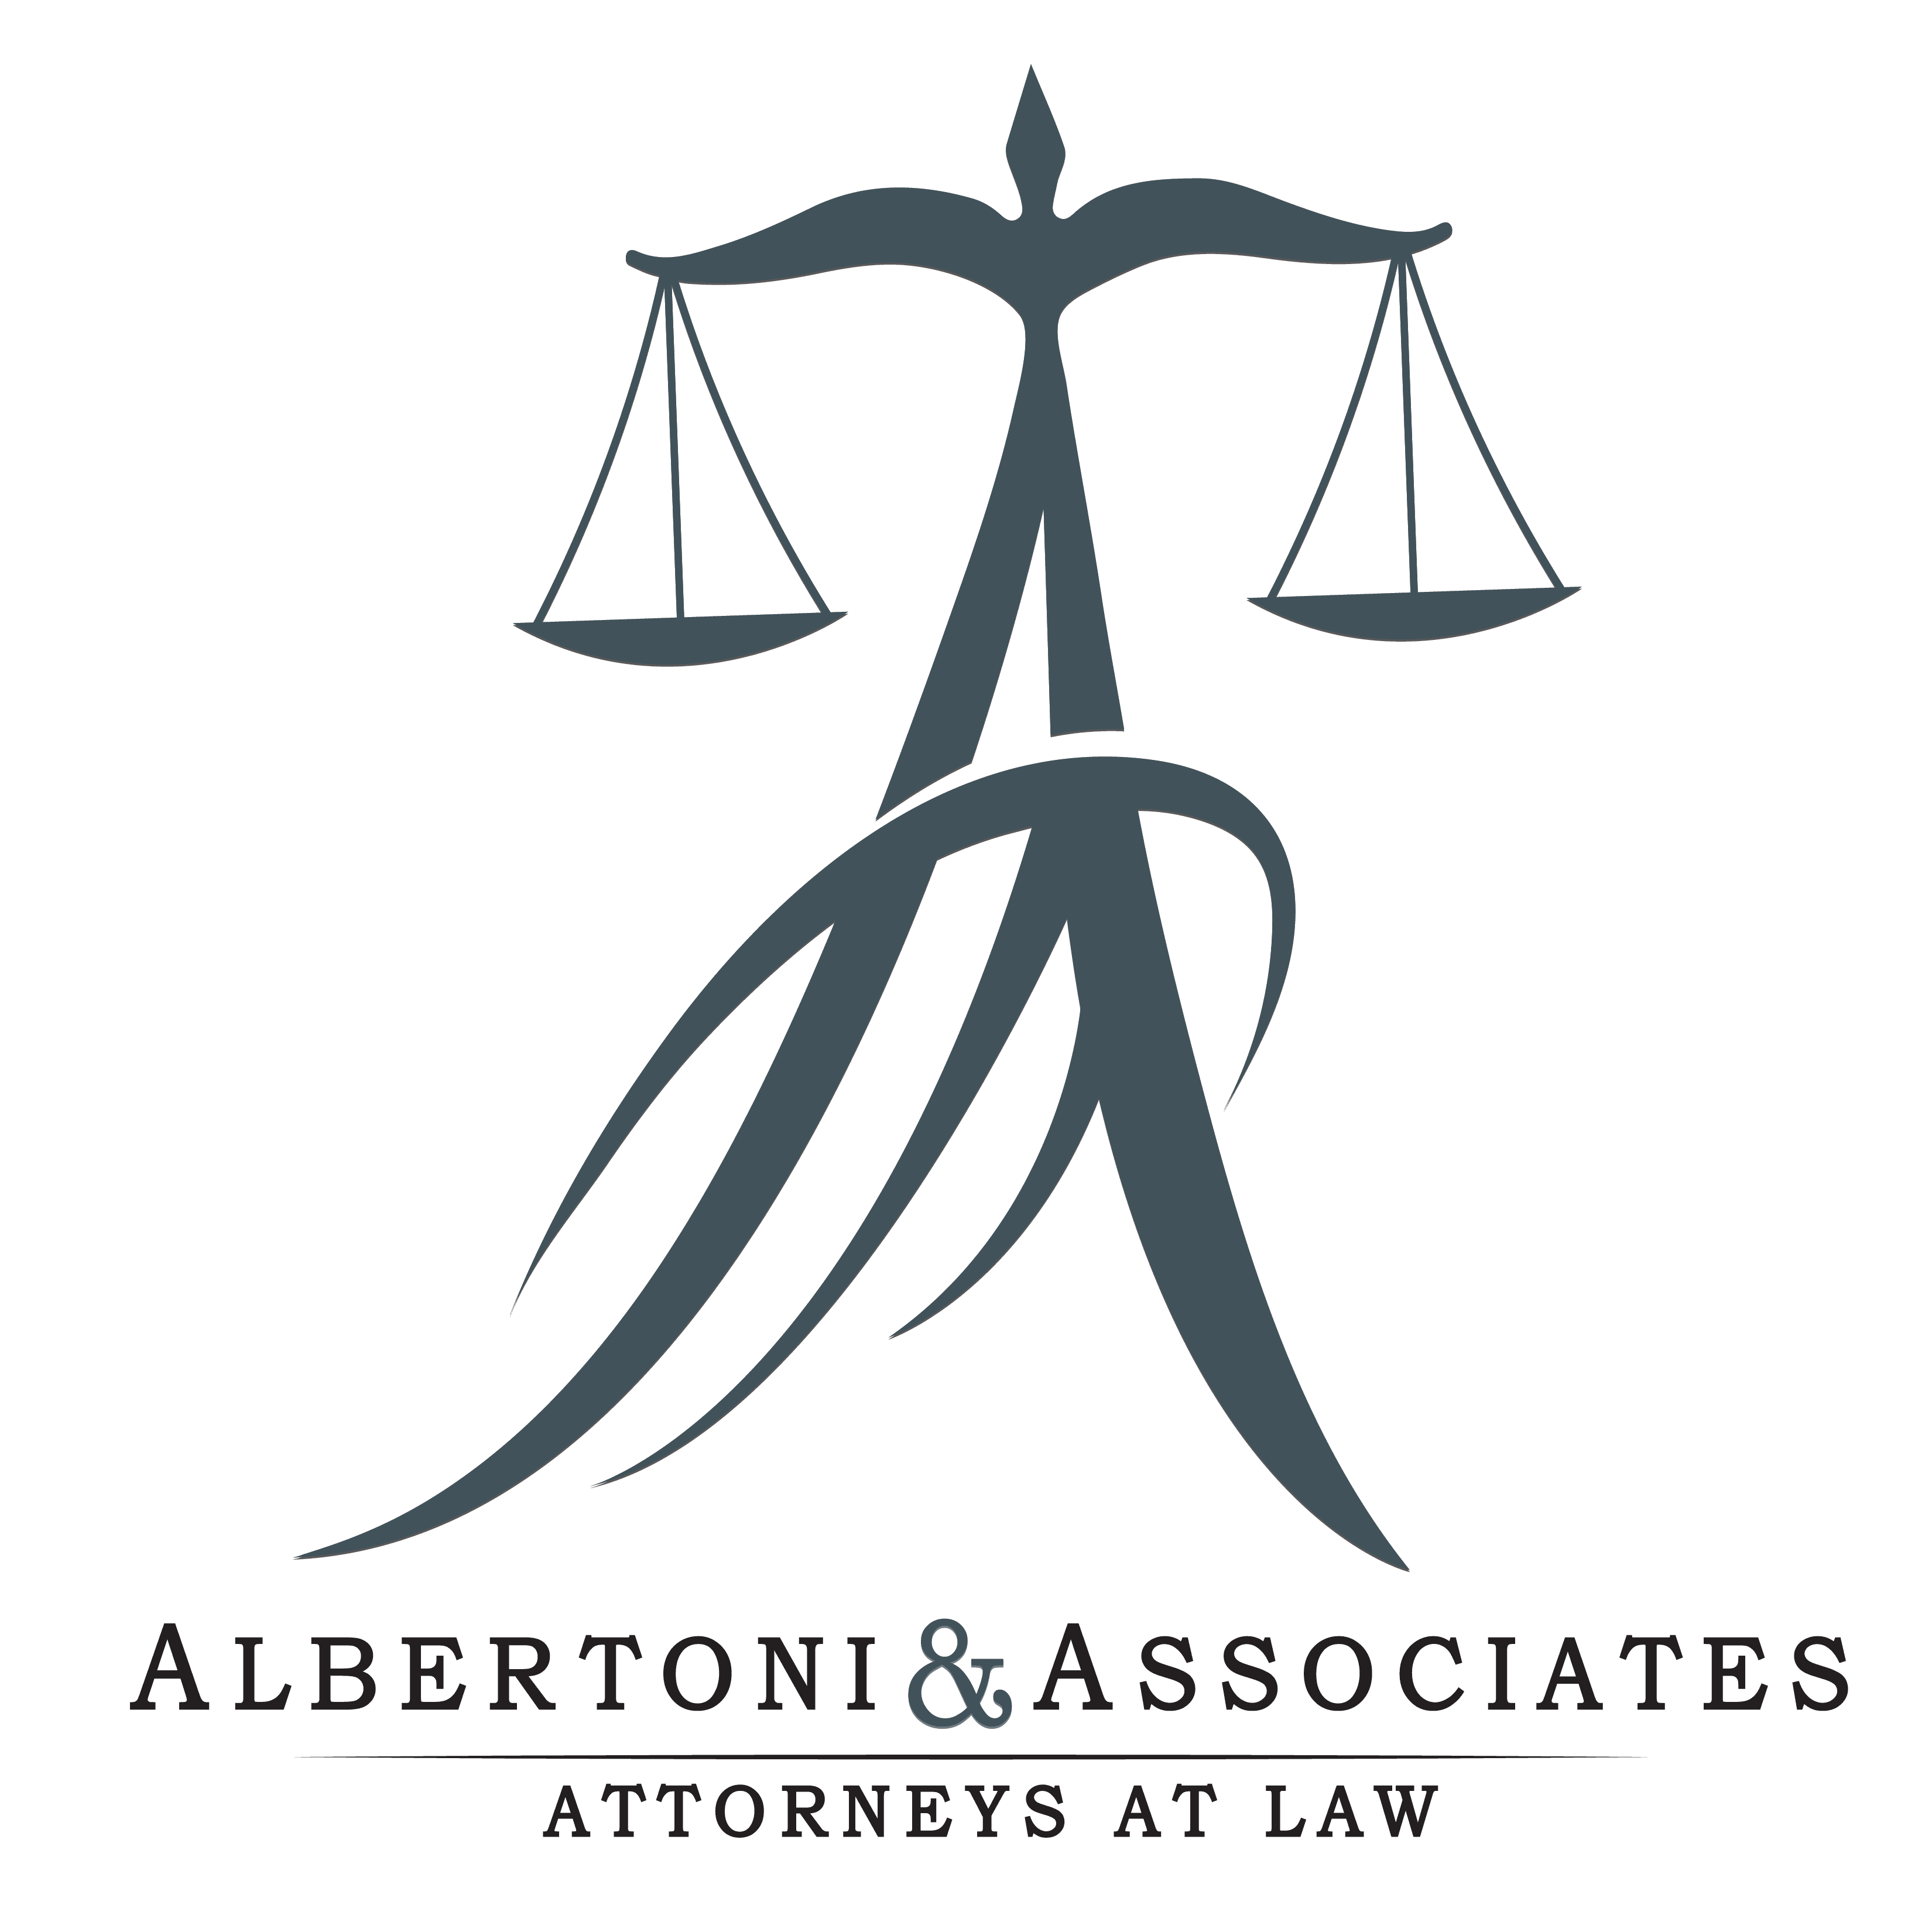 Albertoni & Associates